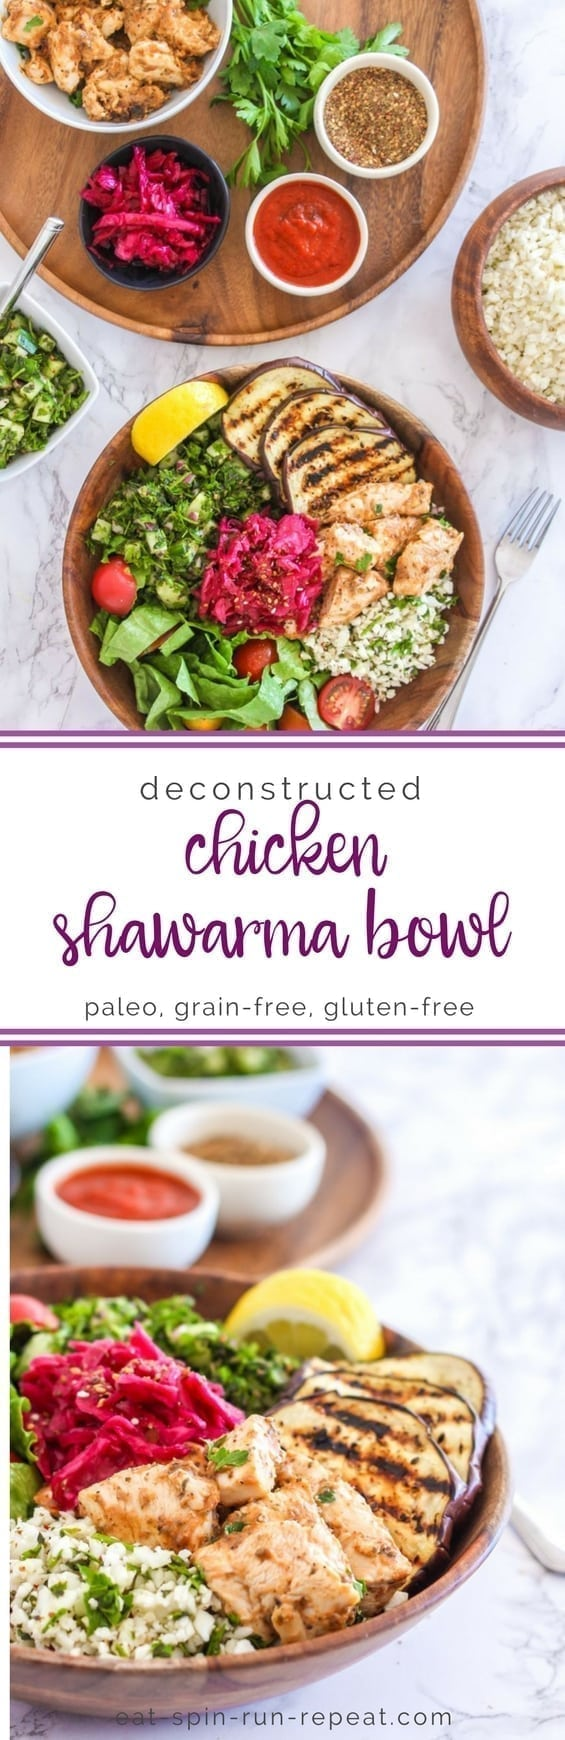 Chicken Shawarma Bowls - paleo, grain-free and gluten-free || Eat Spin Run Repeat